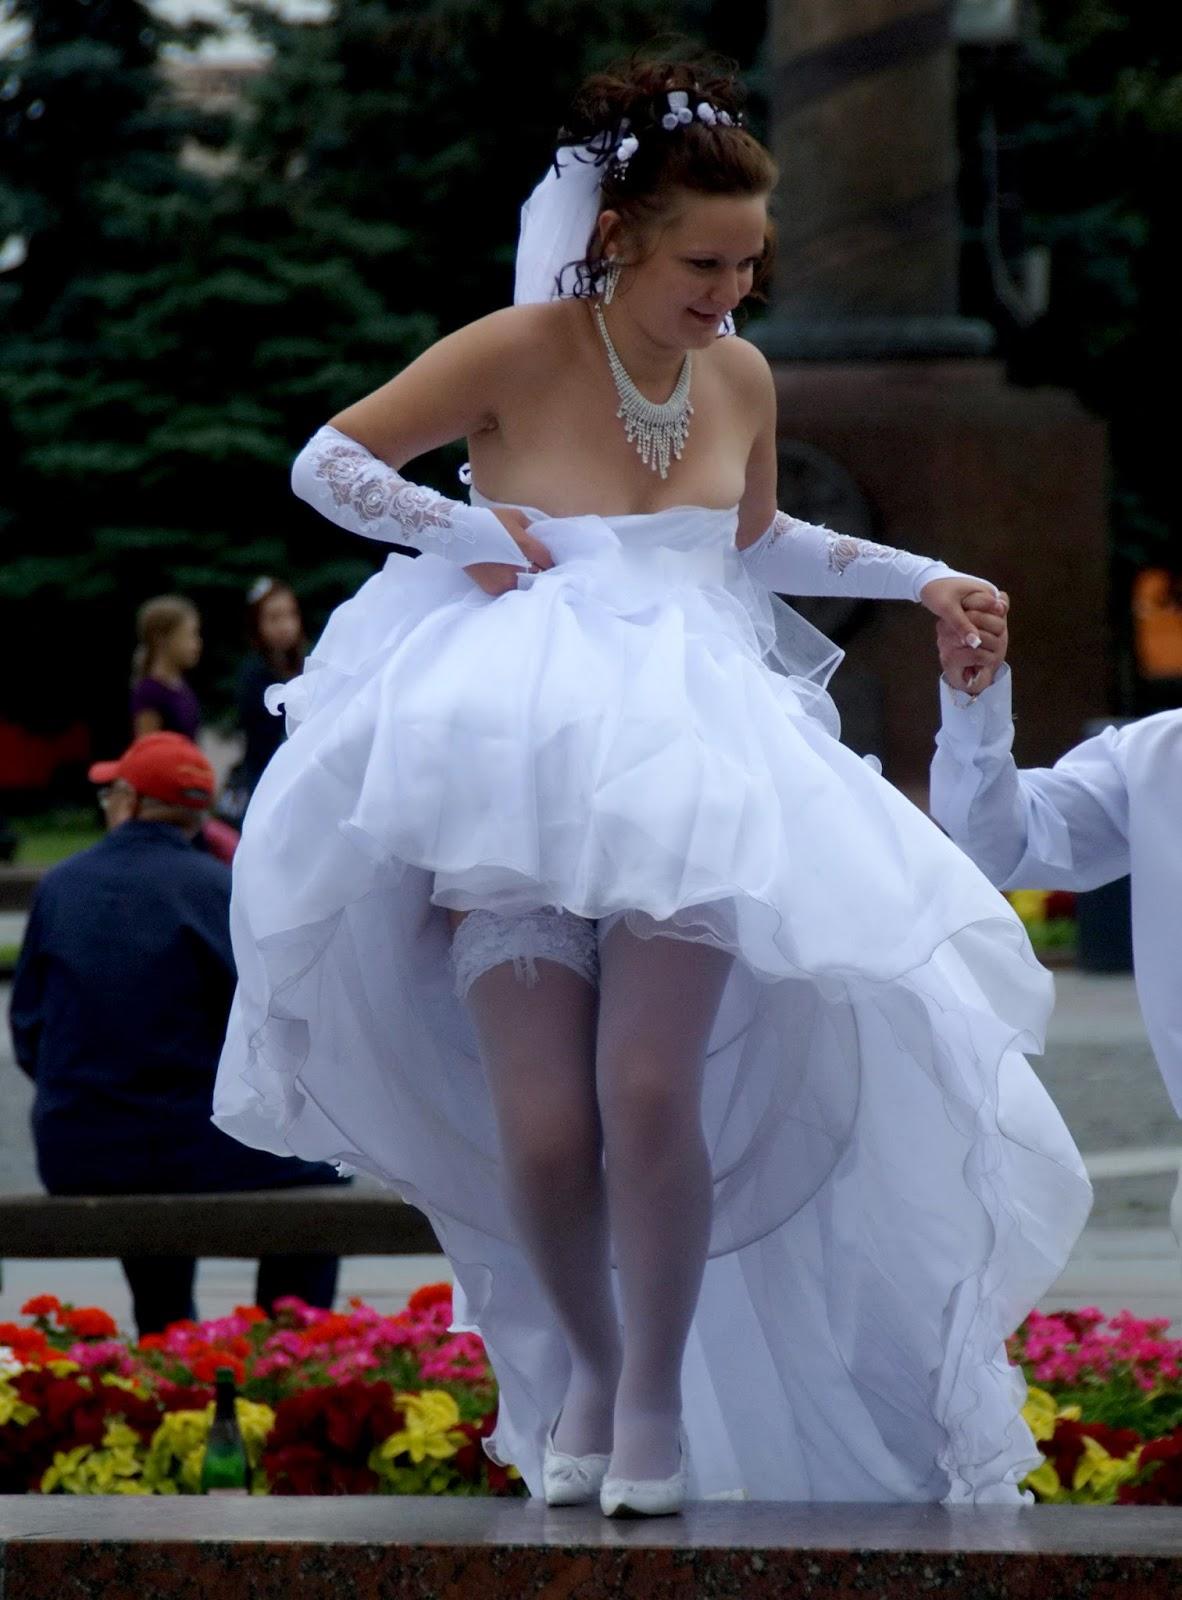 Free Bride Wedding Upskirt